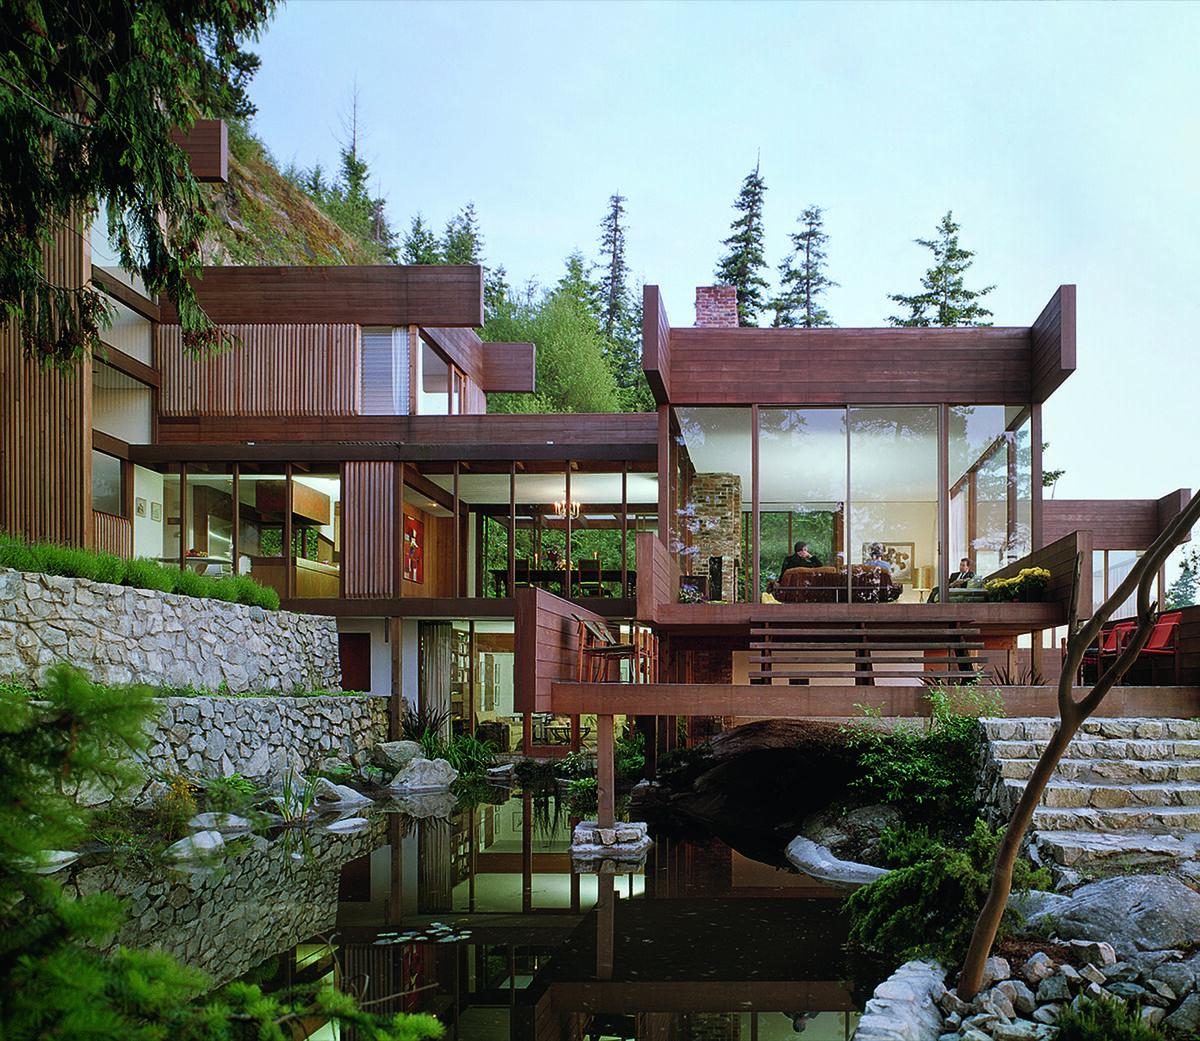 Arthur Erickson, Graham House, 1962, West Vancouver, British Columbia, Canada. Photo by Ezra Stoller/Esto. Courtesy of F2 Architecture and Phaidon.